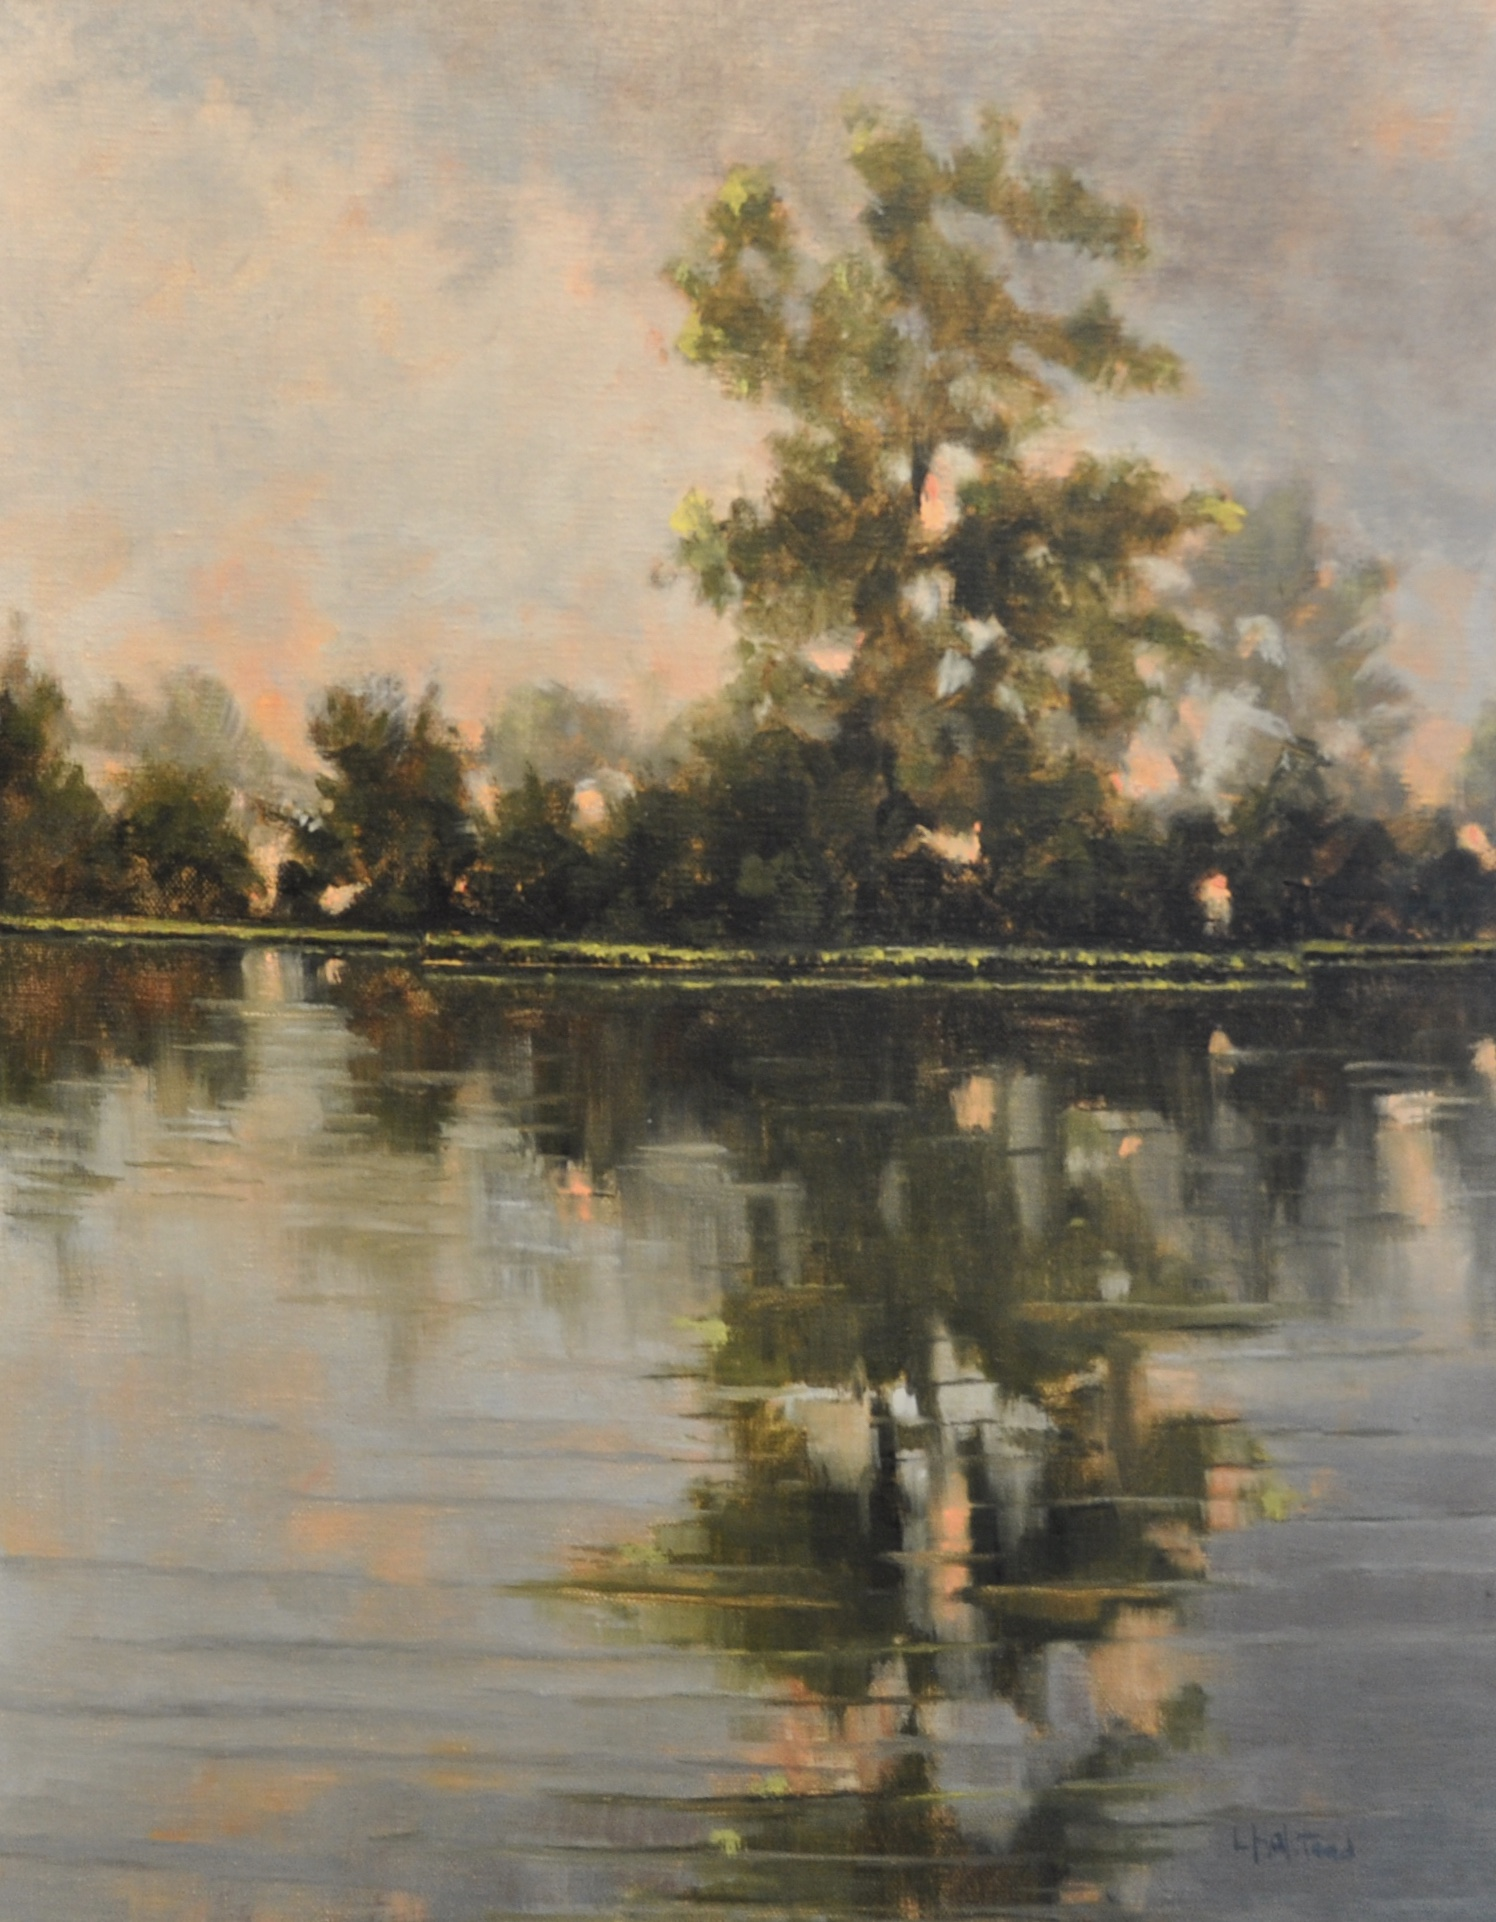 The Rain Passes, Oil on Linen, 11 x 14, sold